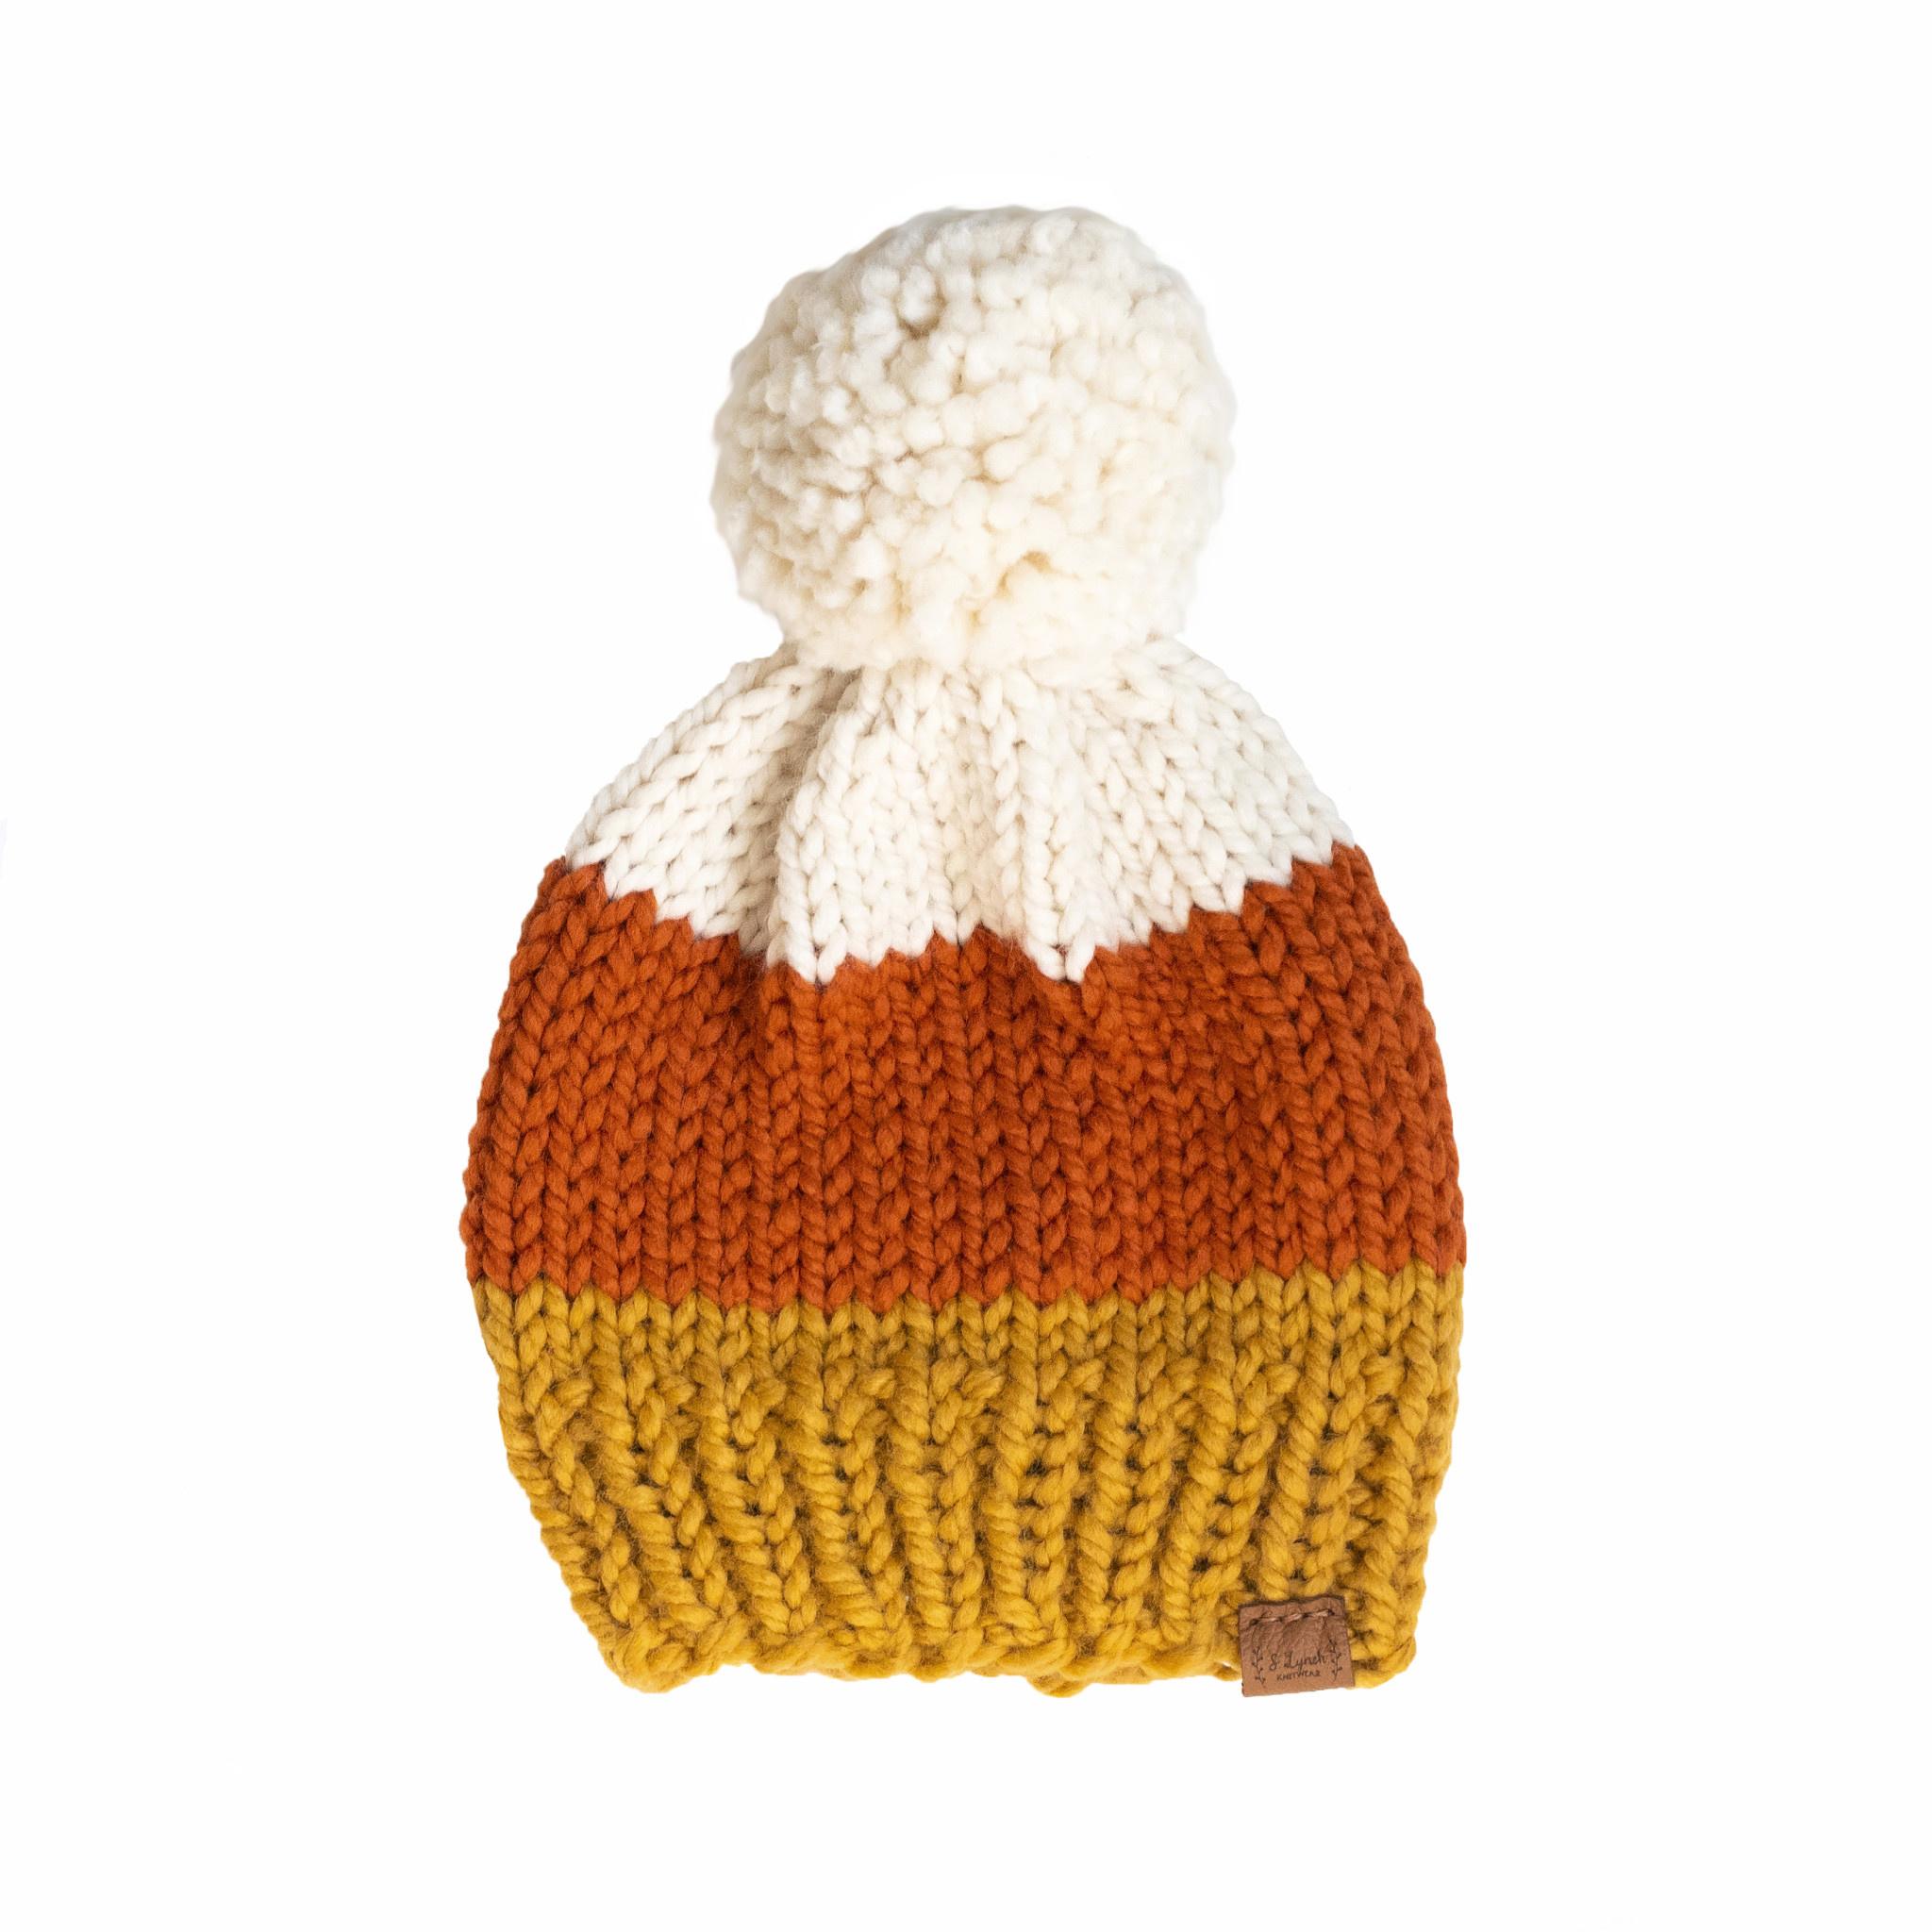 S. Lynch Knitwear Adult Hat - Candy Corn